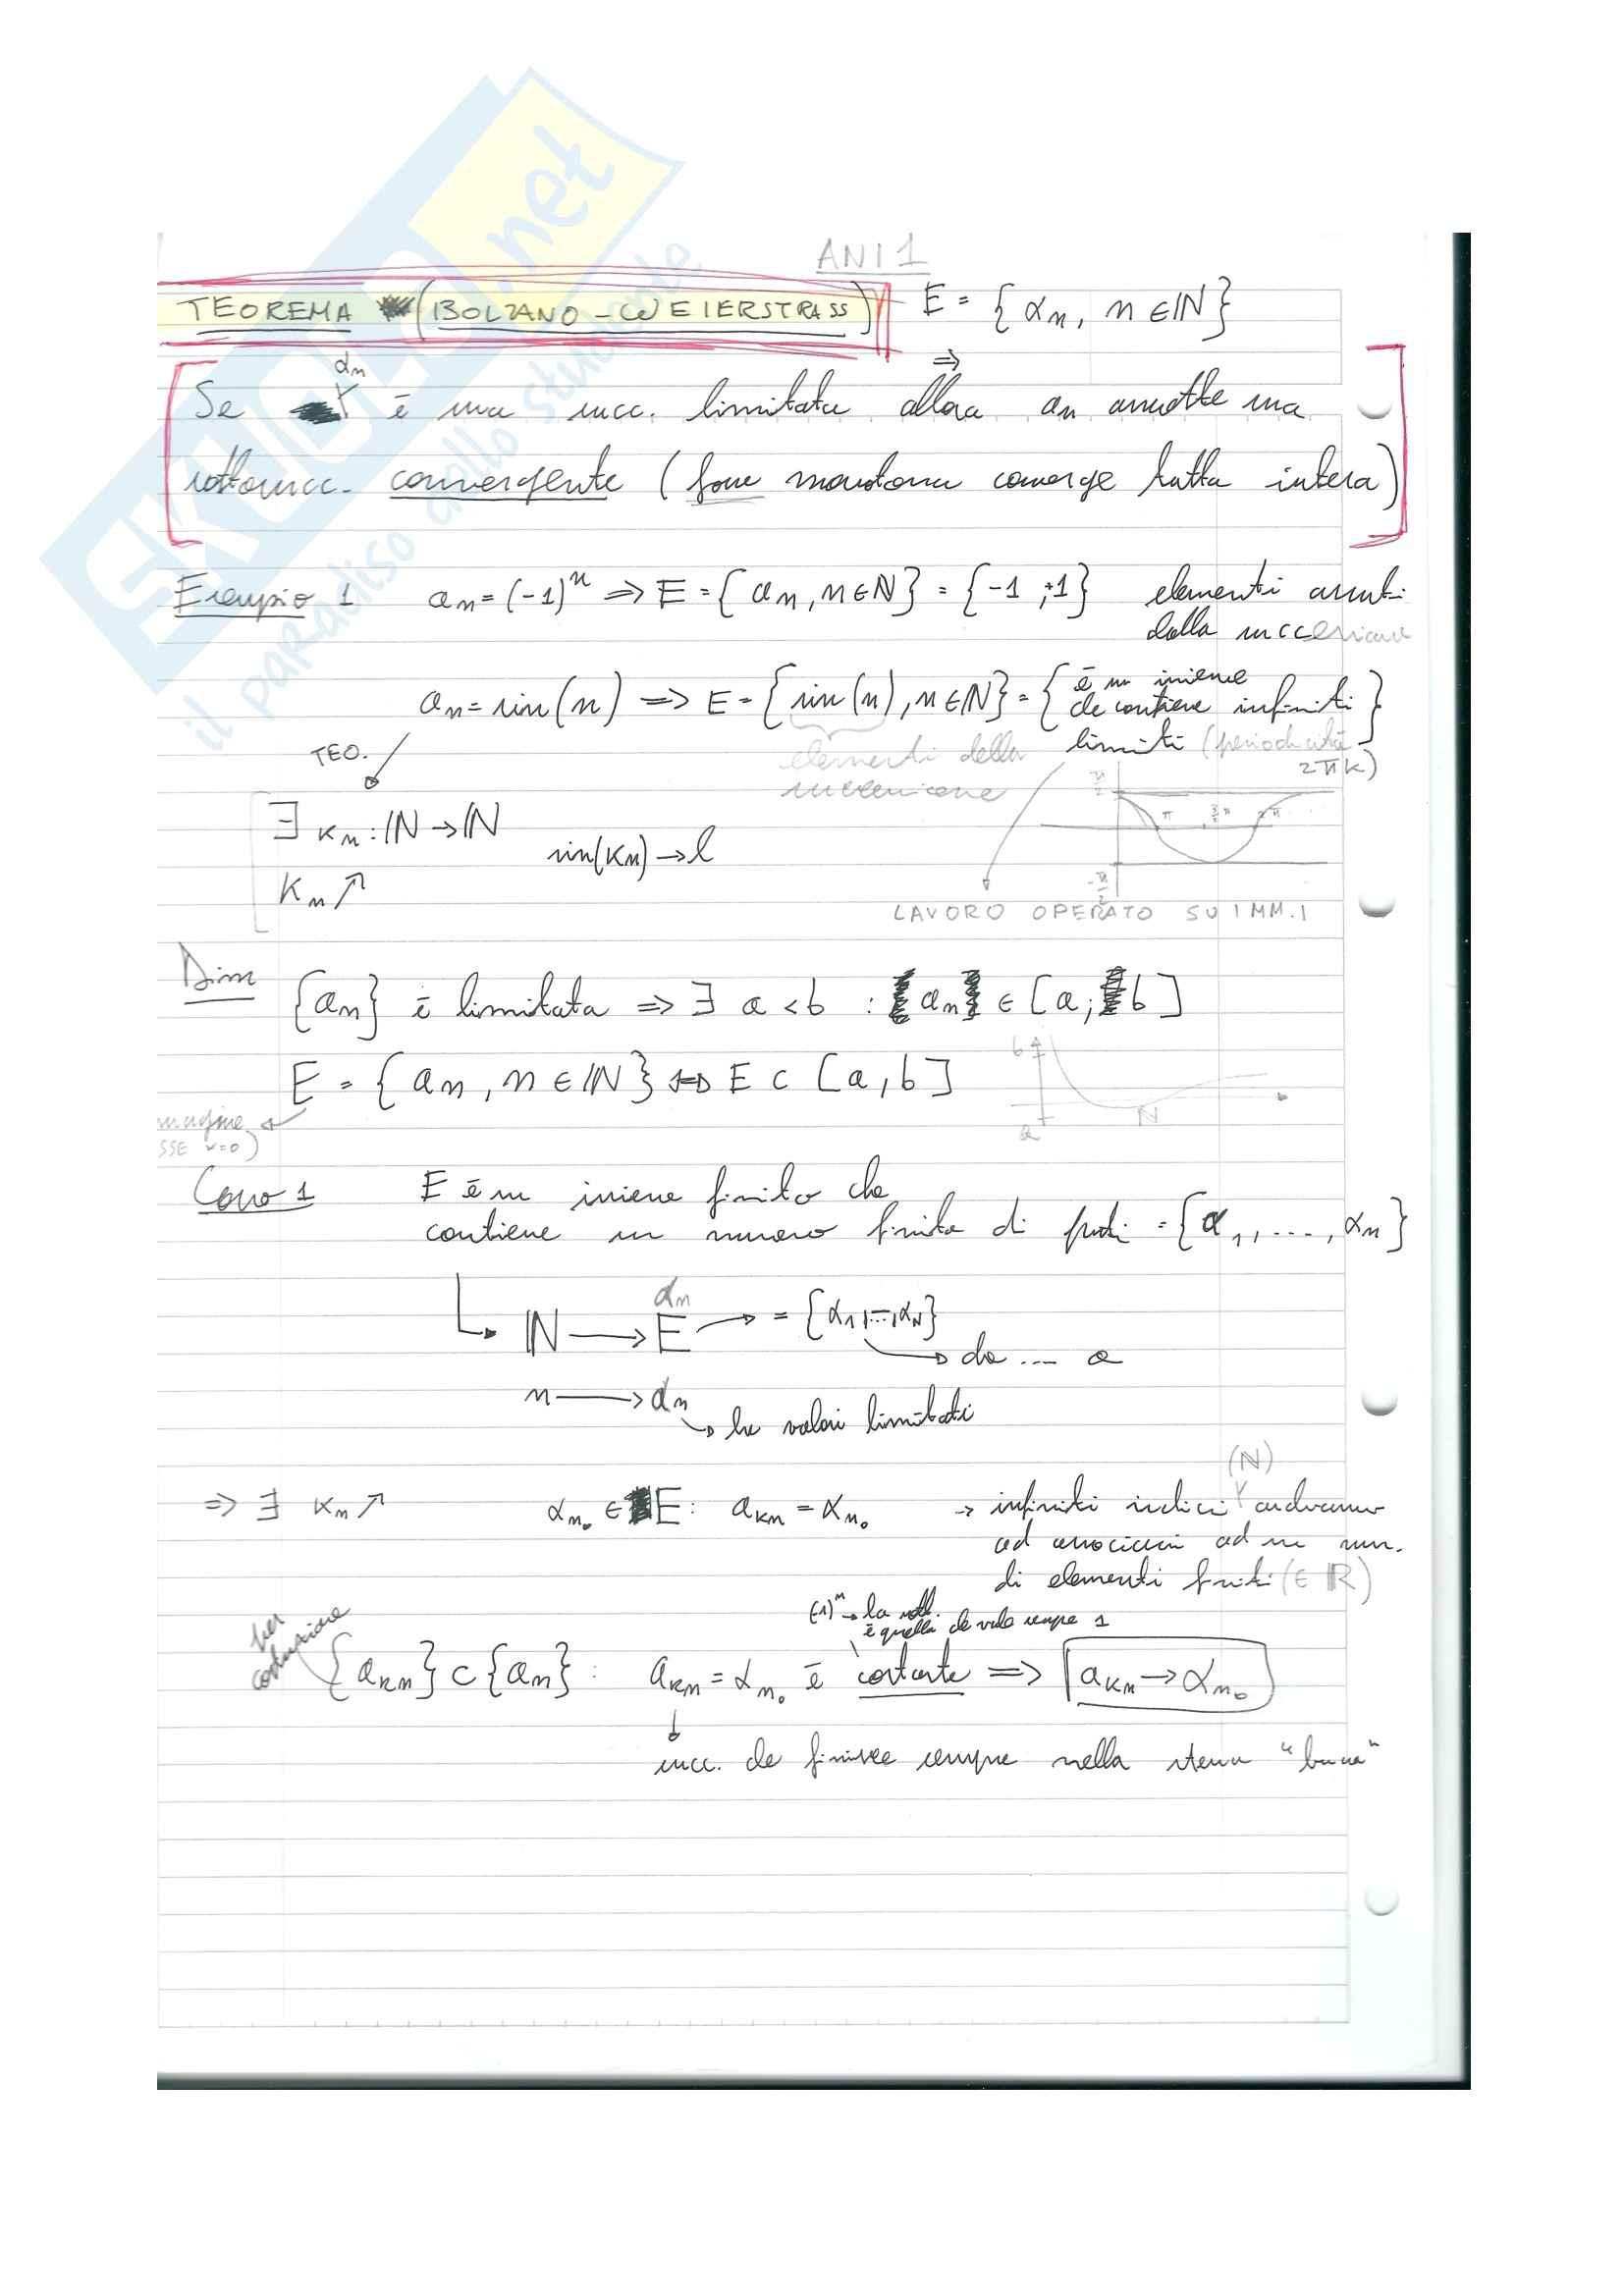 Analisi matematica 1 - Appunti